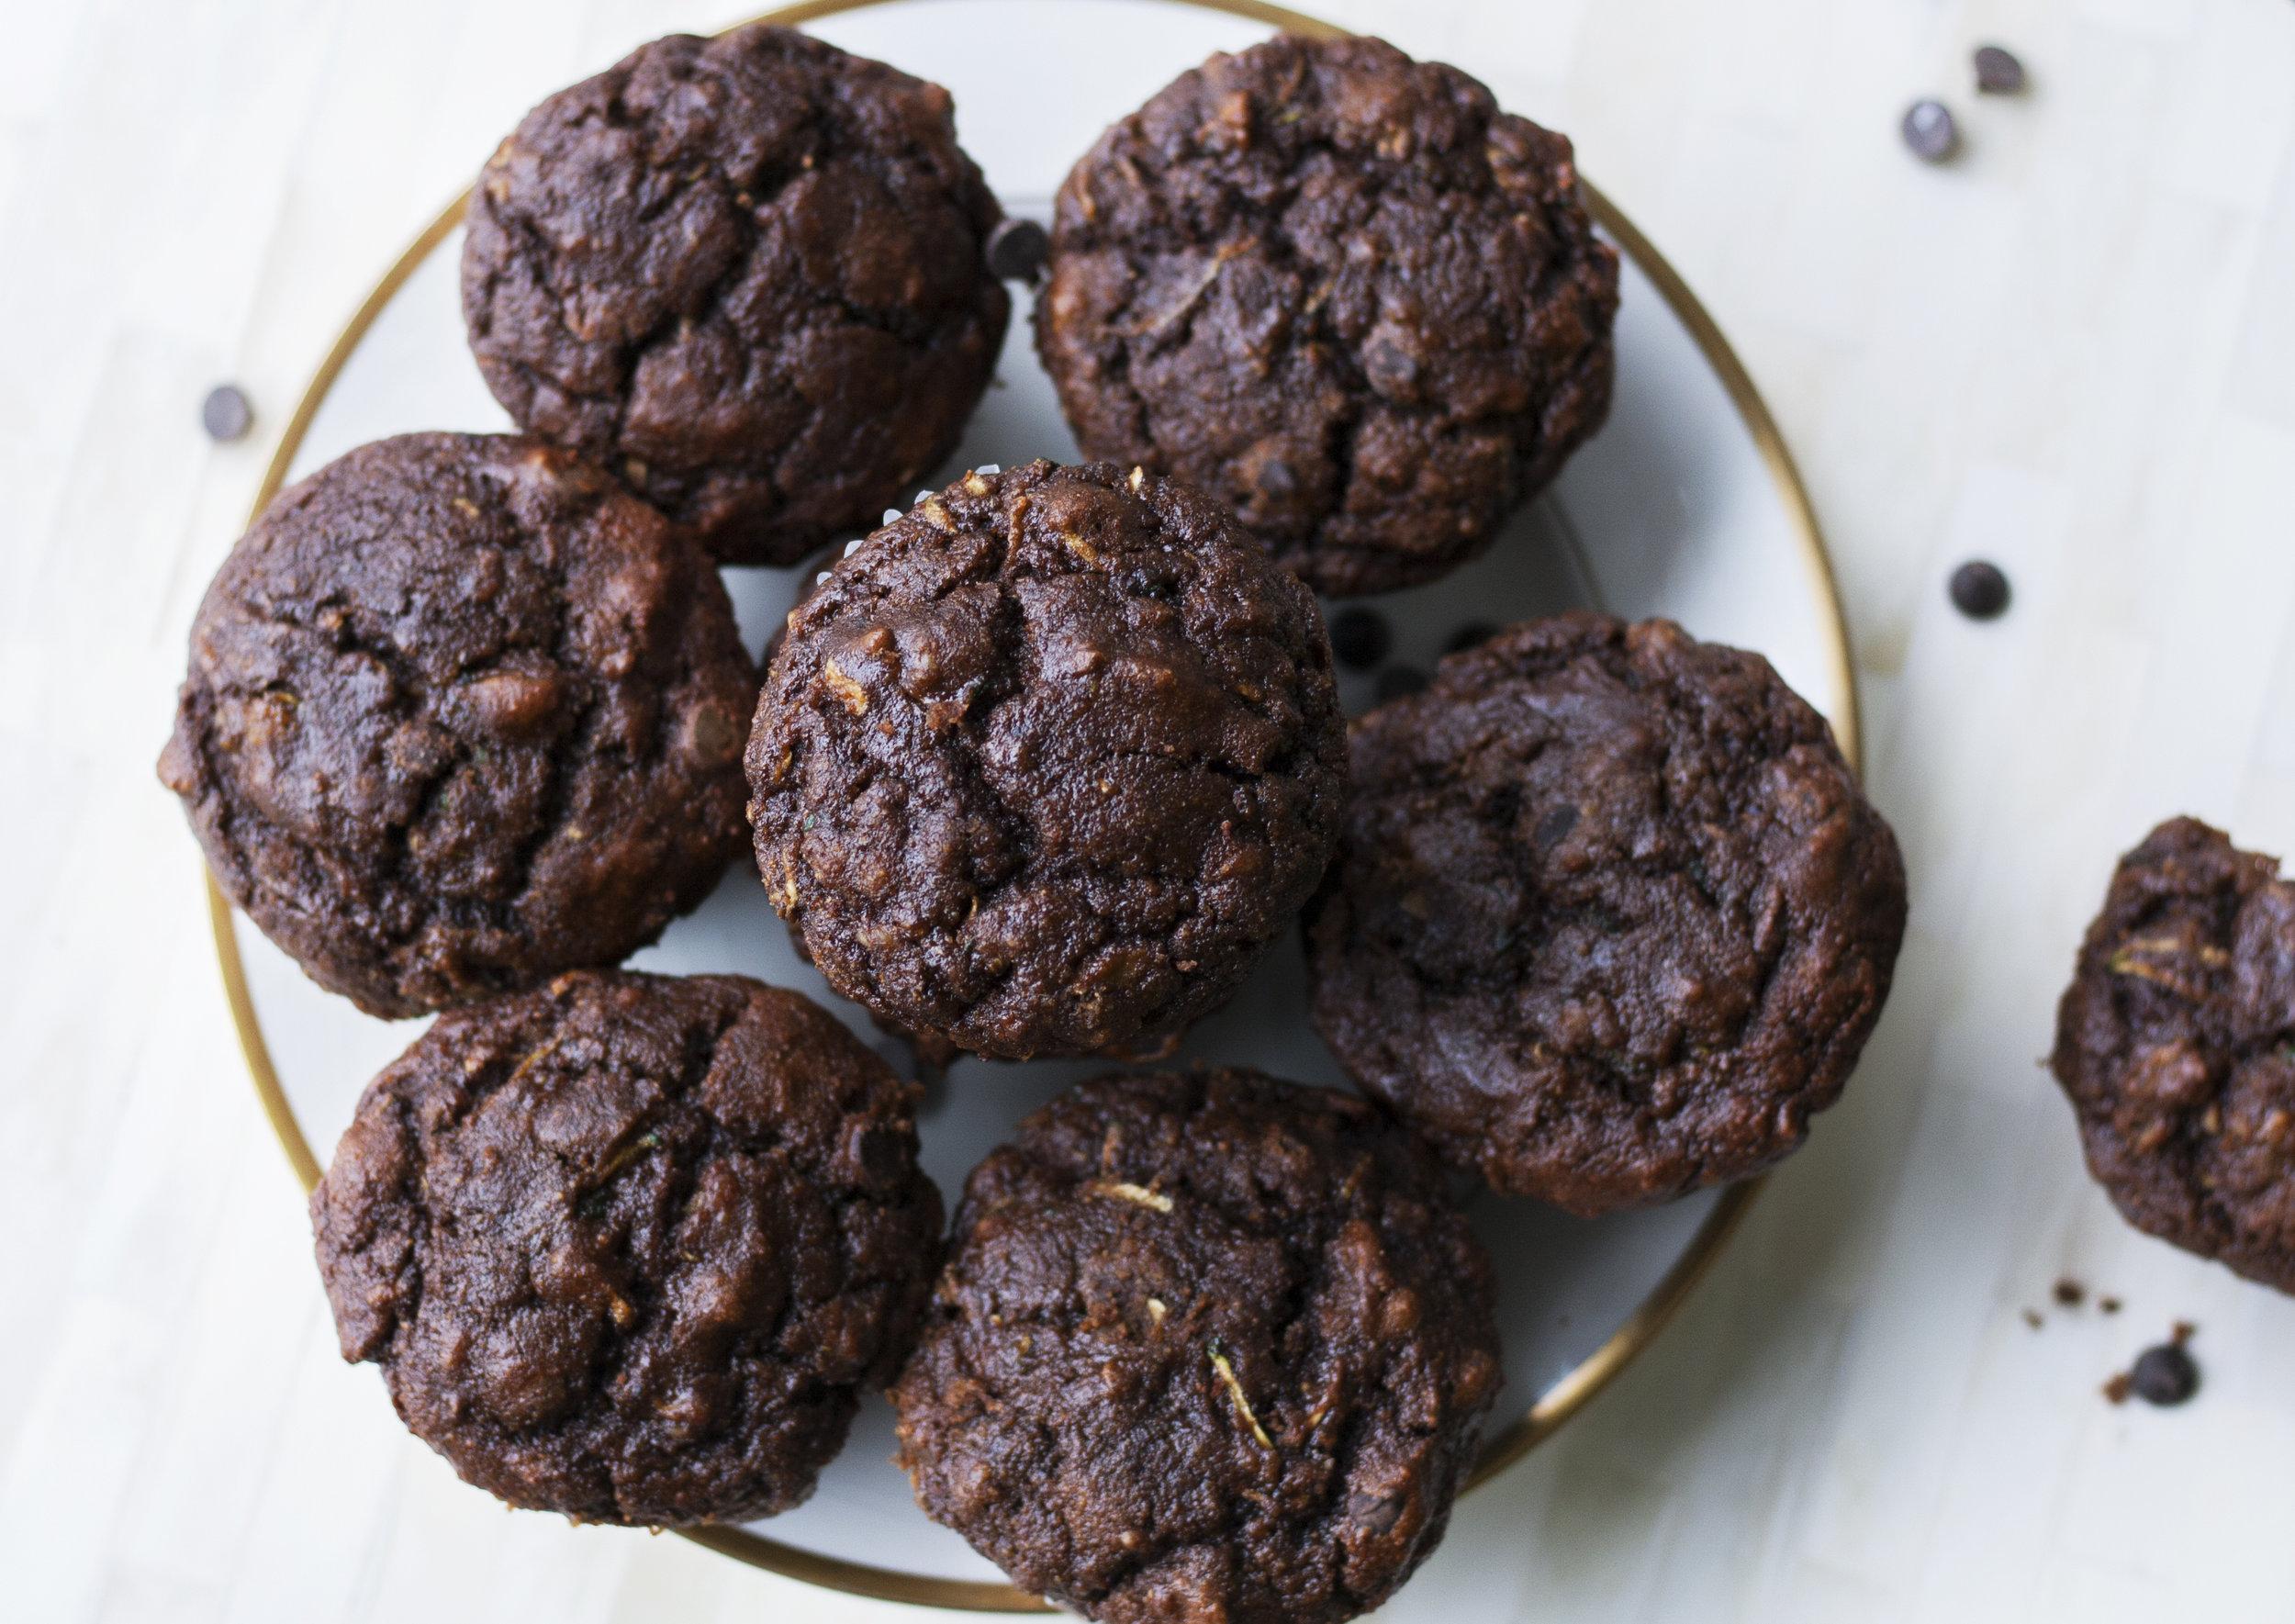 Plate of Chocolate Zucchini Muffins_II.jpg